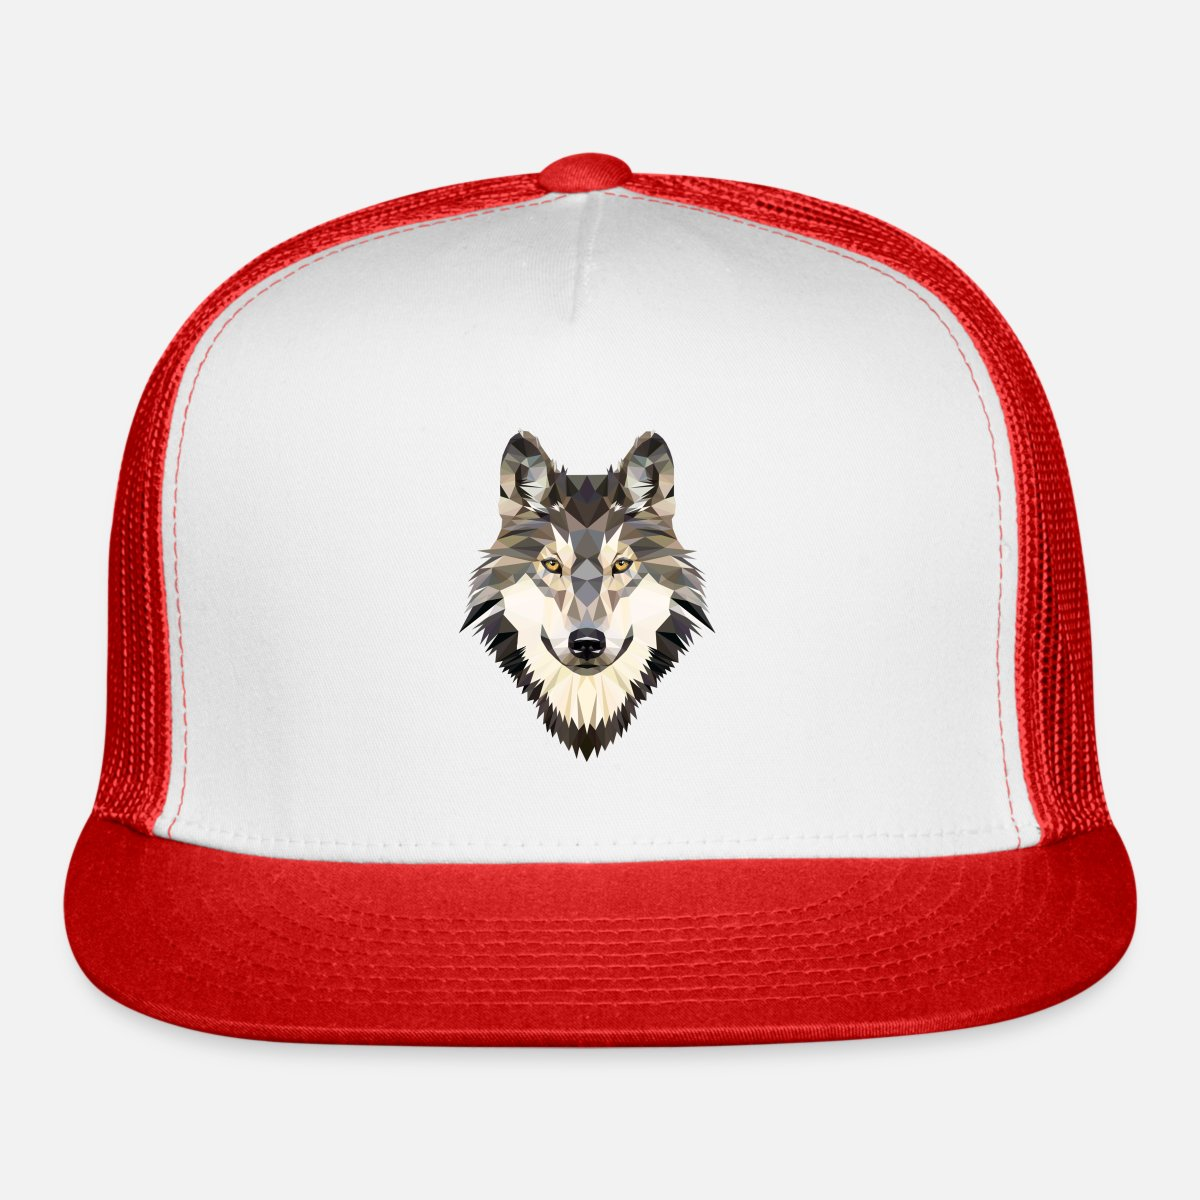 BH Cool Designs #Flacco Comfortable Dad Hat Baseball Cap